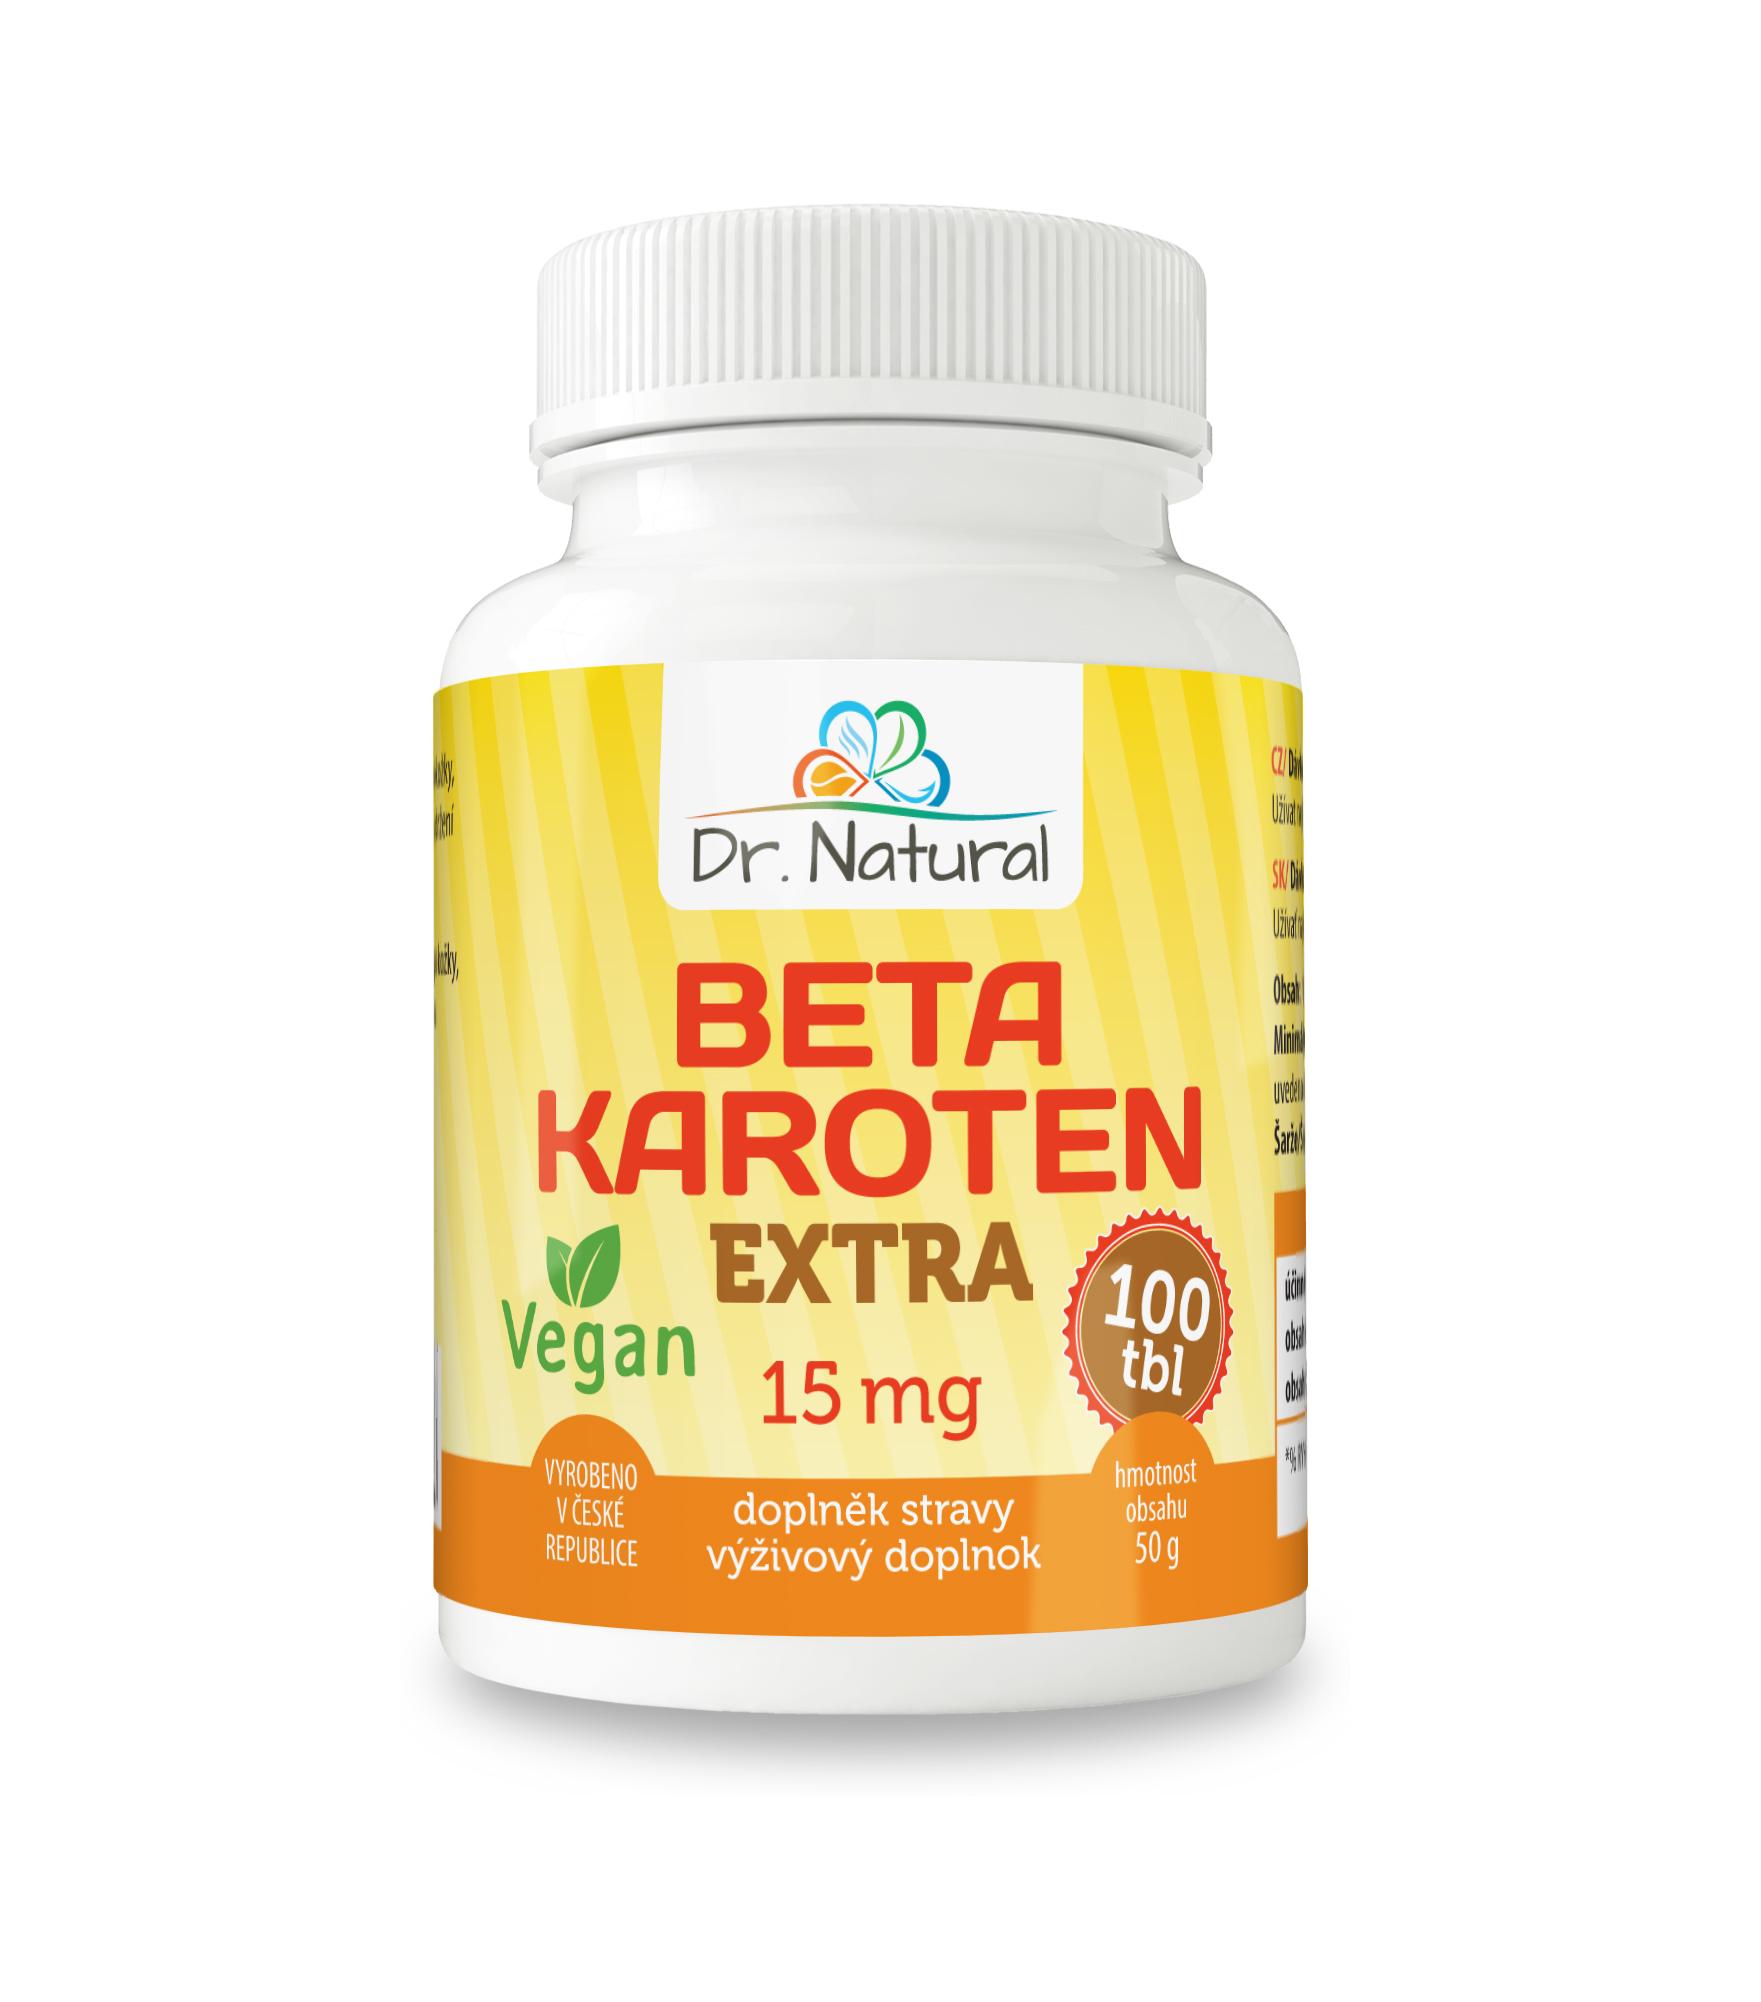 Dr.Natural Betakaroten extra 15 mg 100 tbl.